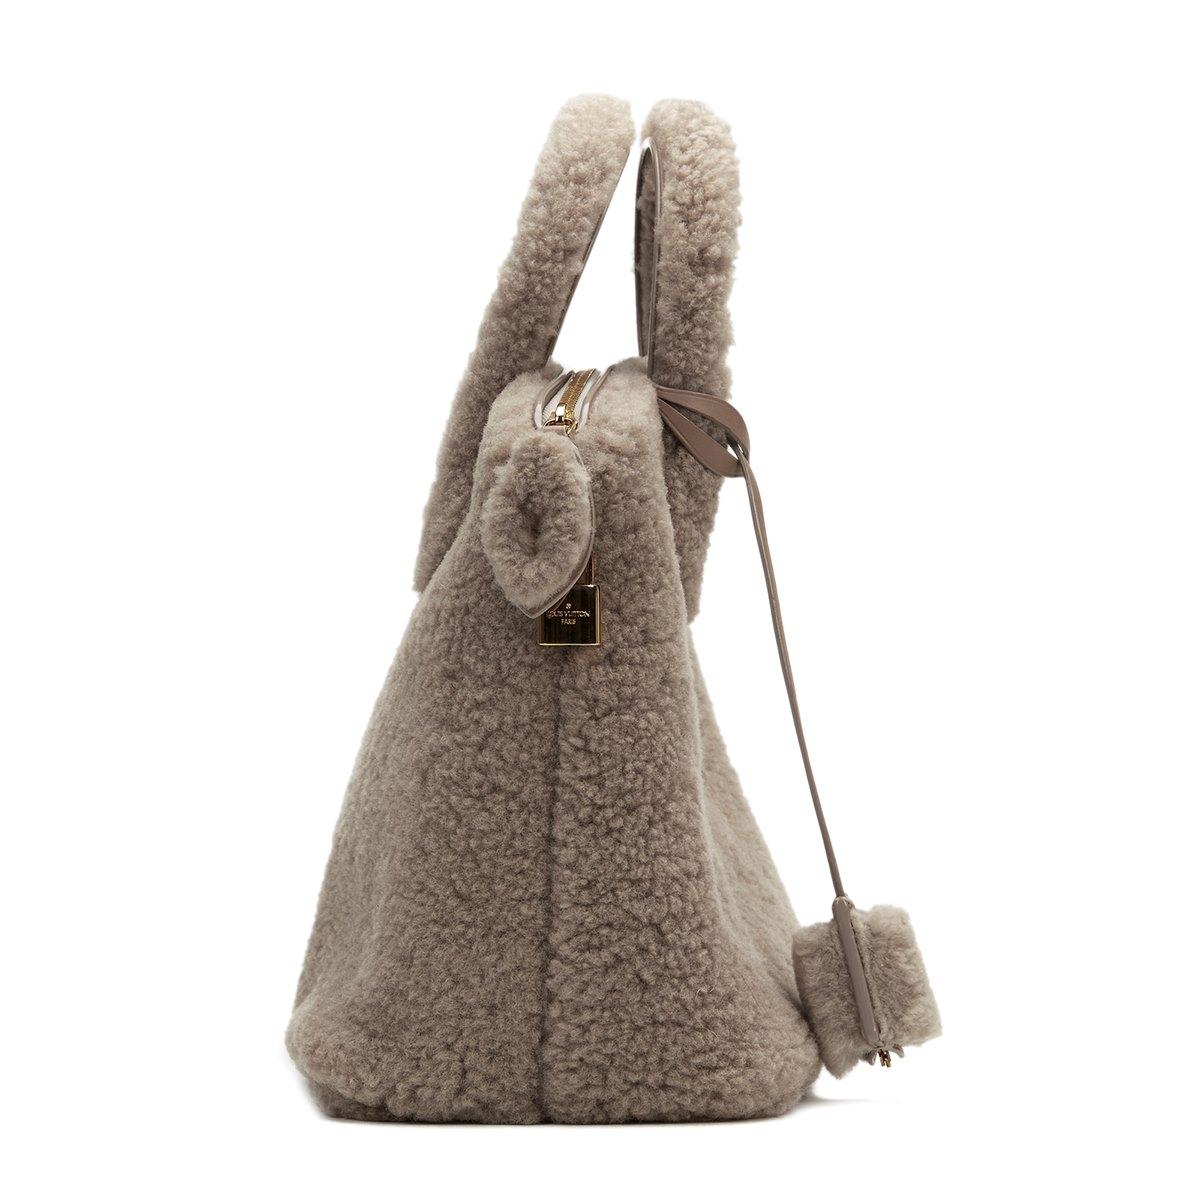 louis vuitton lockit pulsion 2011 hb880 second hand handbags